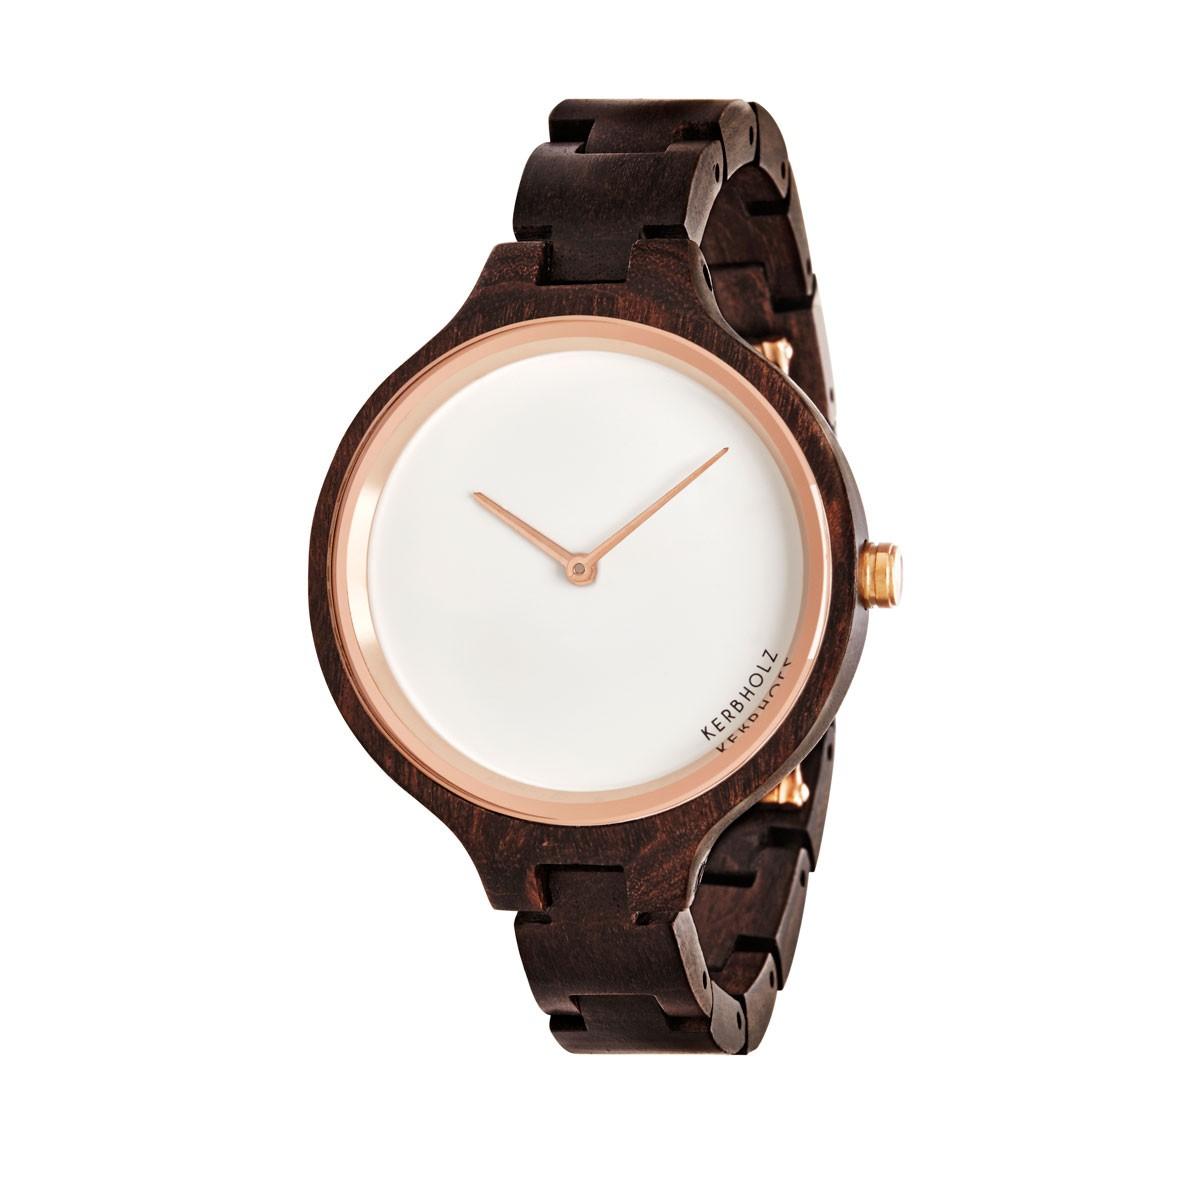 """Hinze"" Black Chacate - Damen-Armbanduhr aus Sandelholz von Kerbholz"